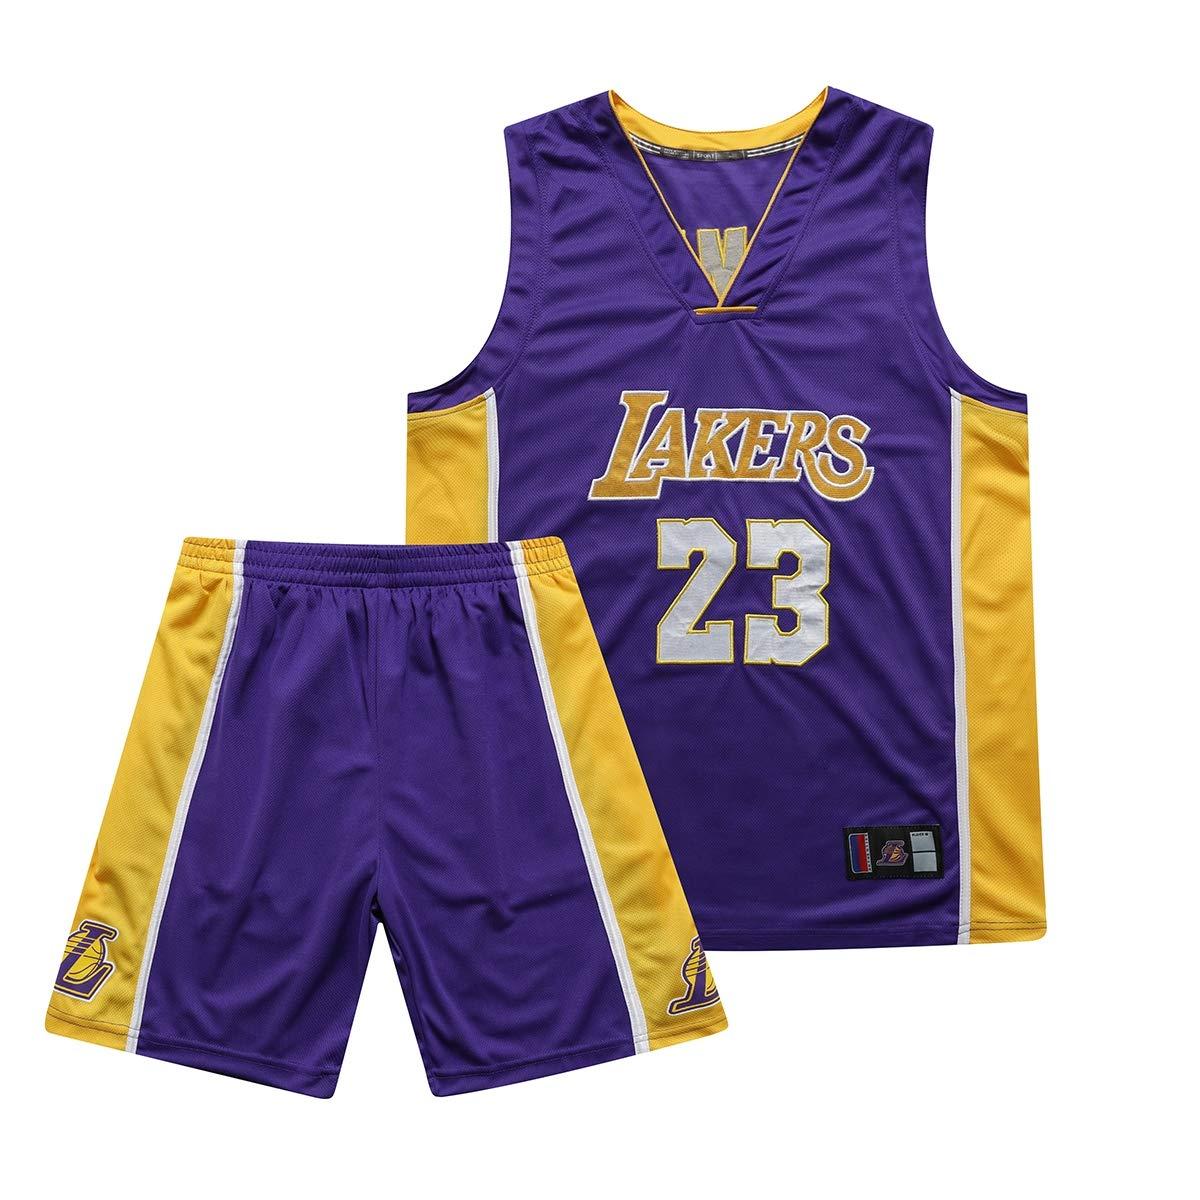 QZH NBA Bambini//Giovani//Adulti 8-20 Anni Los Angeles Lakers 23 Maglia Lebron James Ricamo